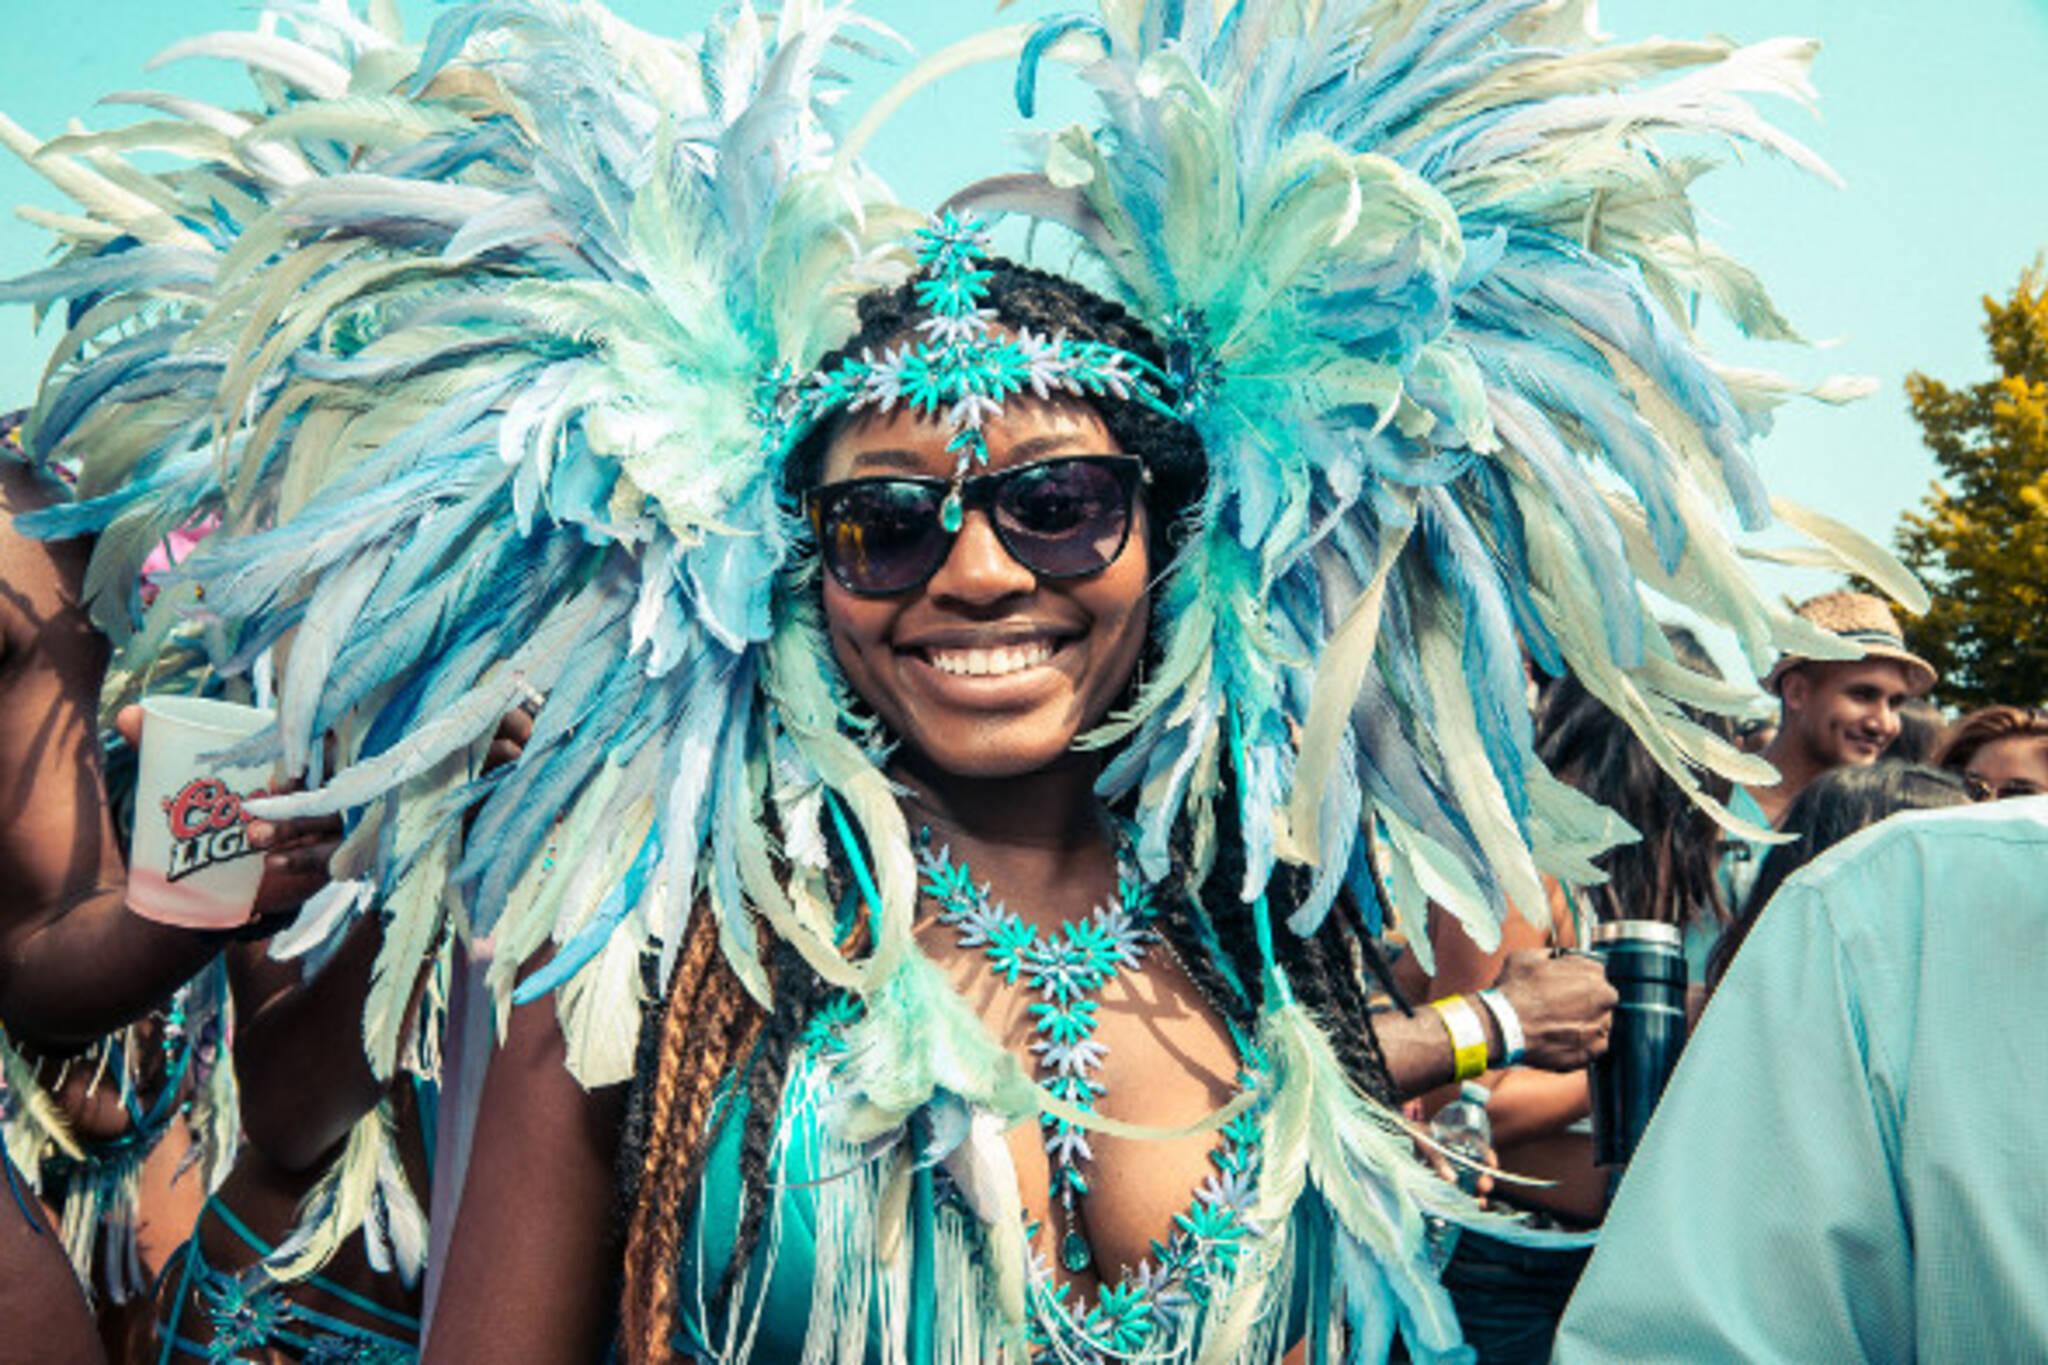 40 bright and beautiful photos from Caribana